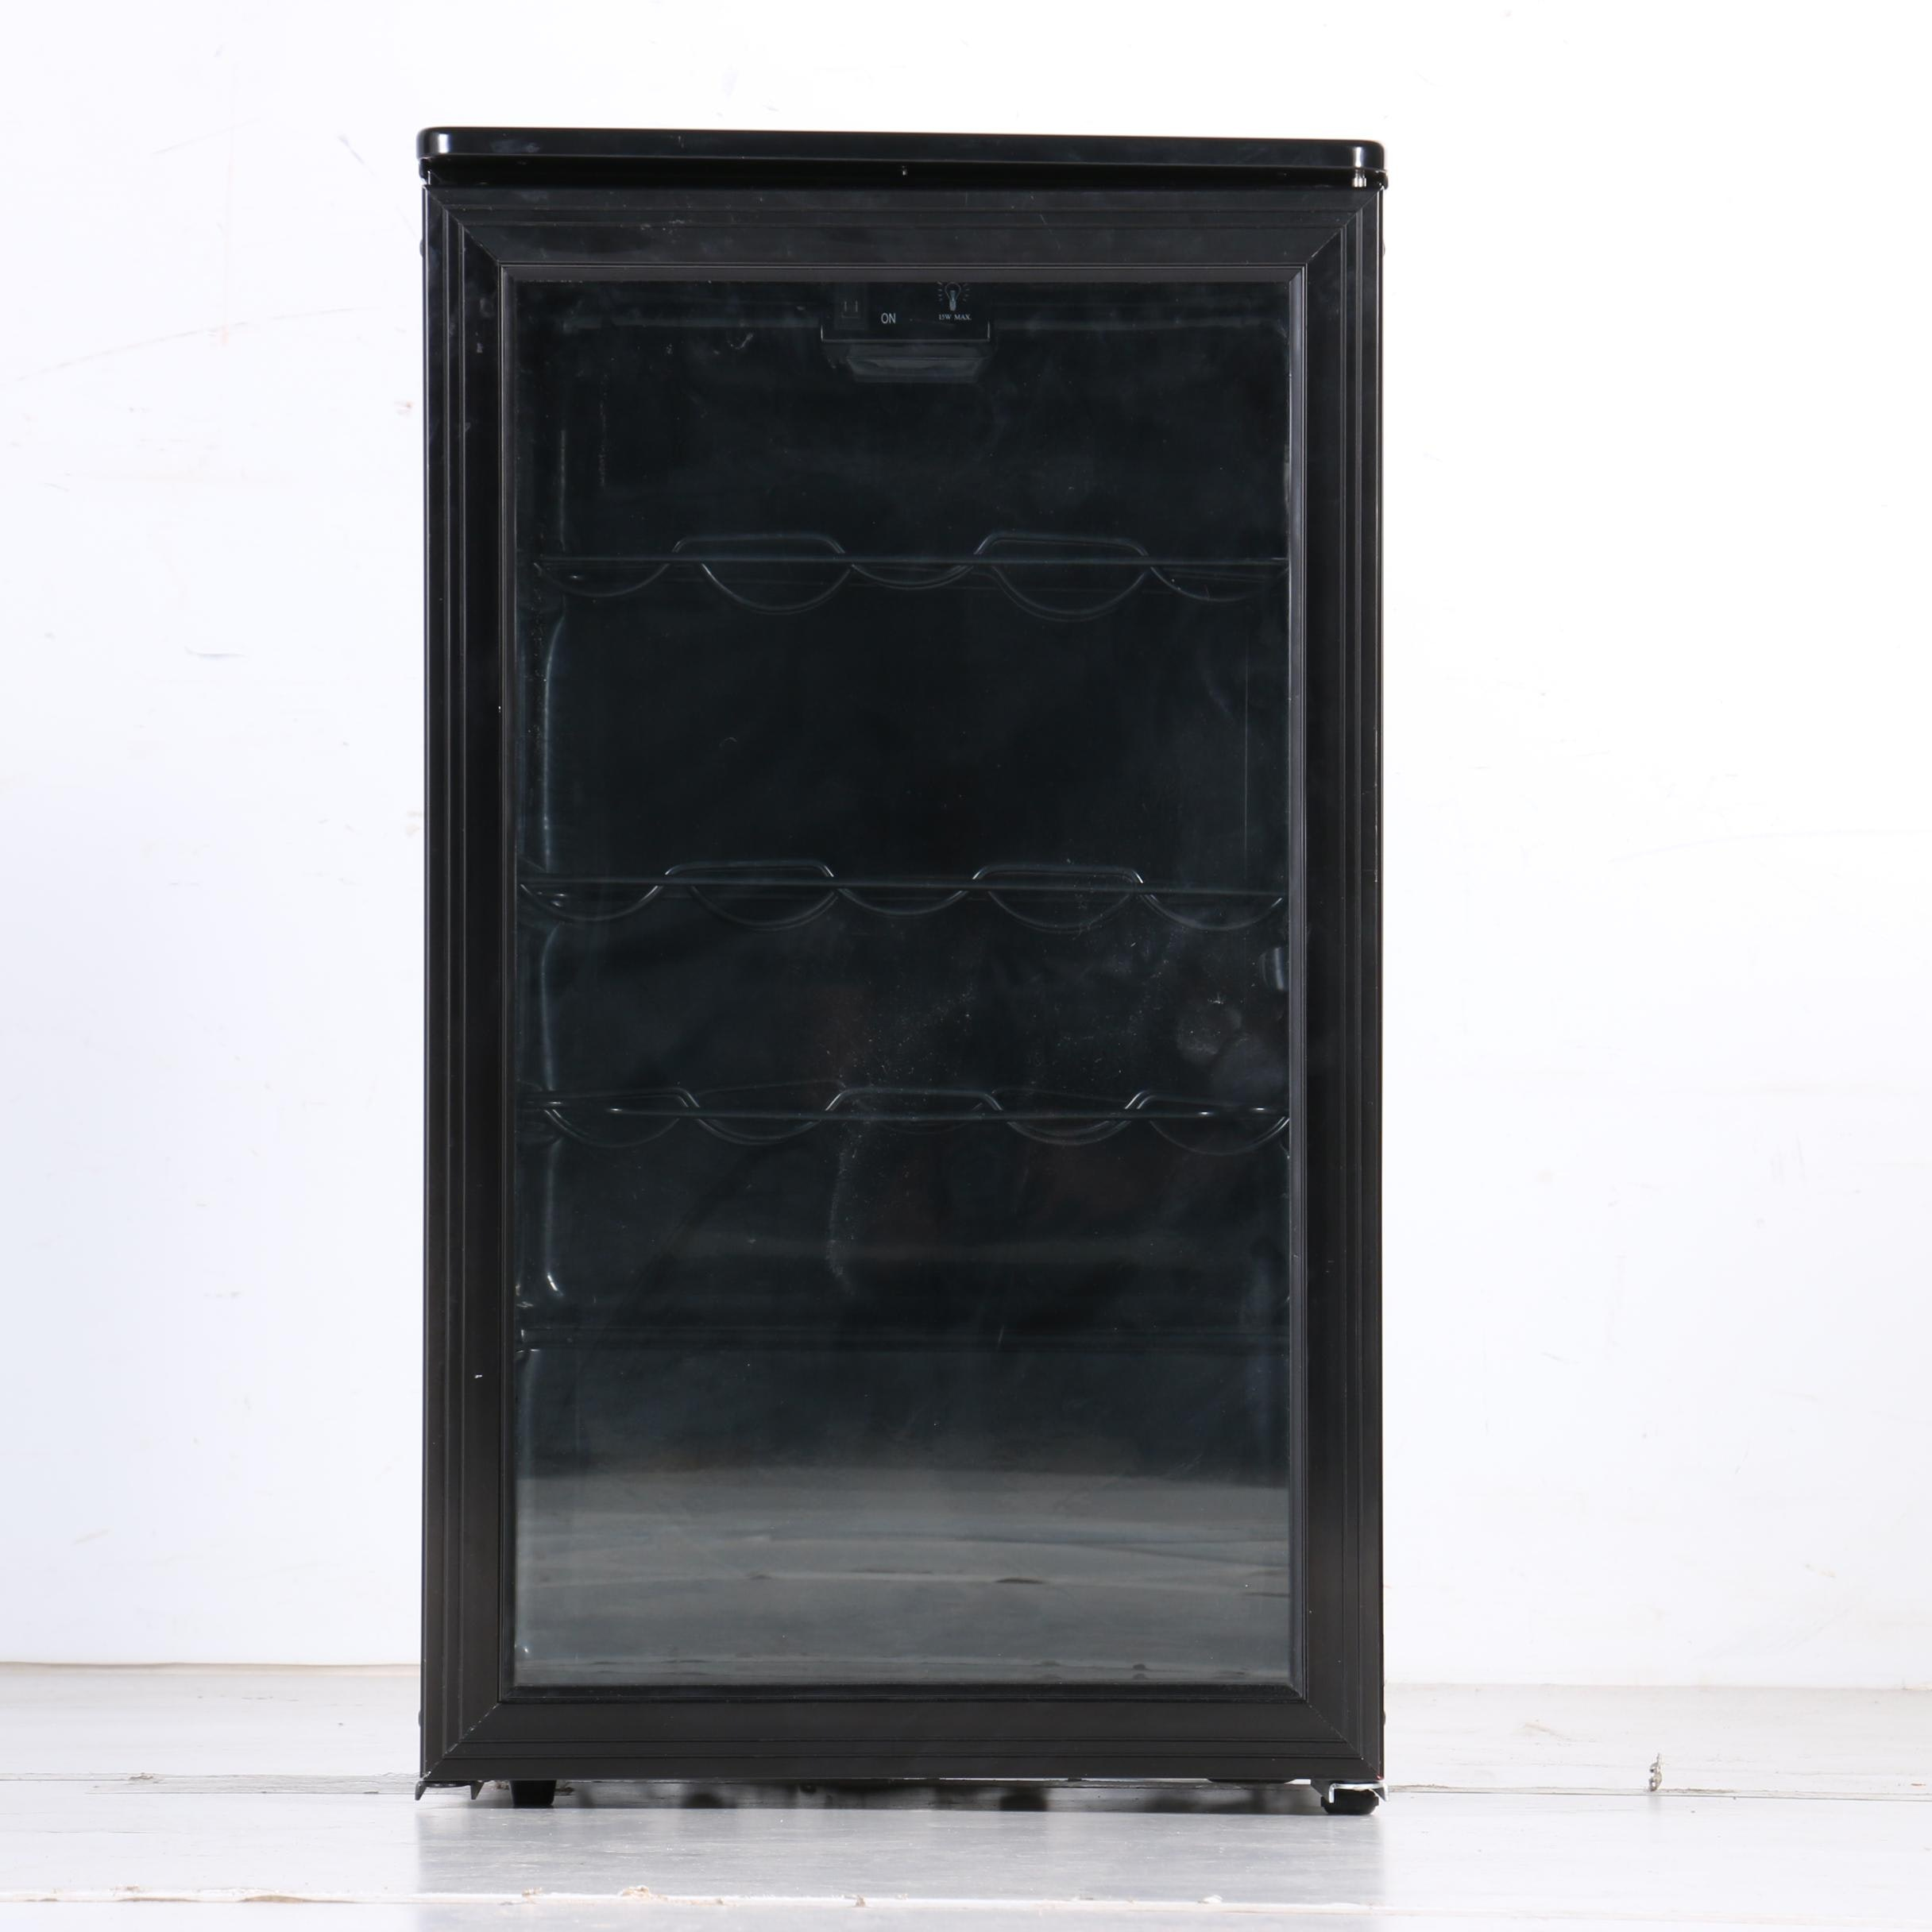 Pepsi Storage Refrigerator Cooler By True Ebth